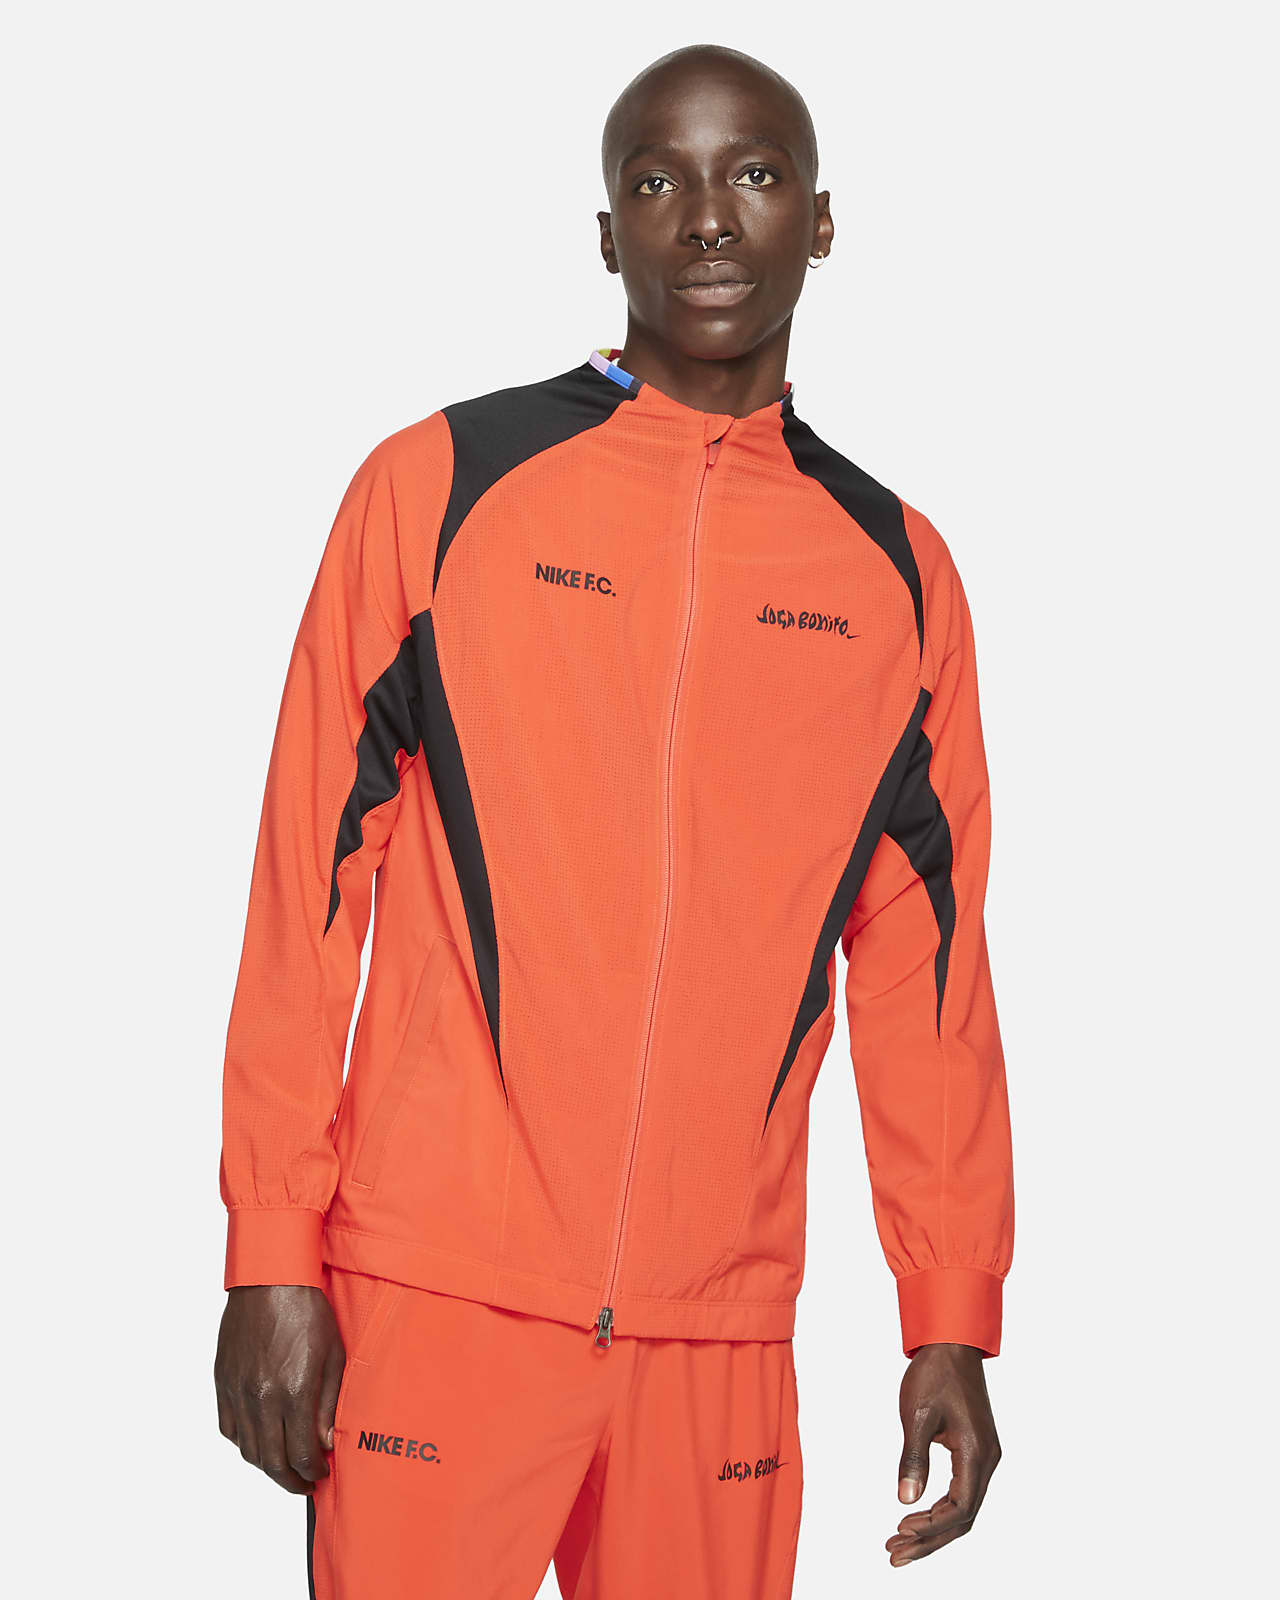 Pánská tkaná fotbalová bunda Nike F.C.